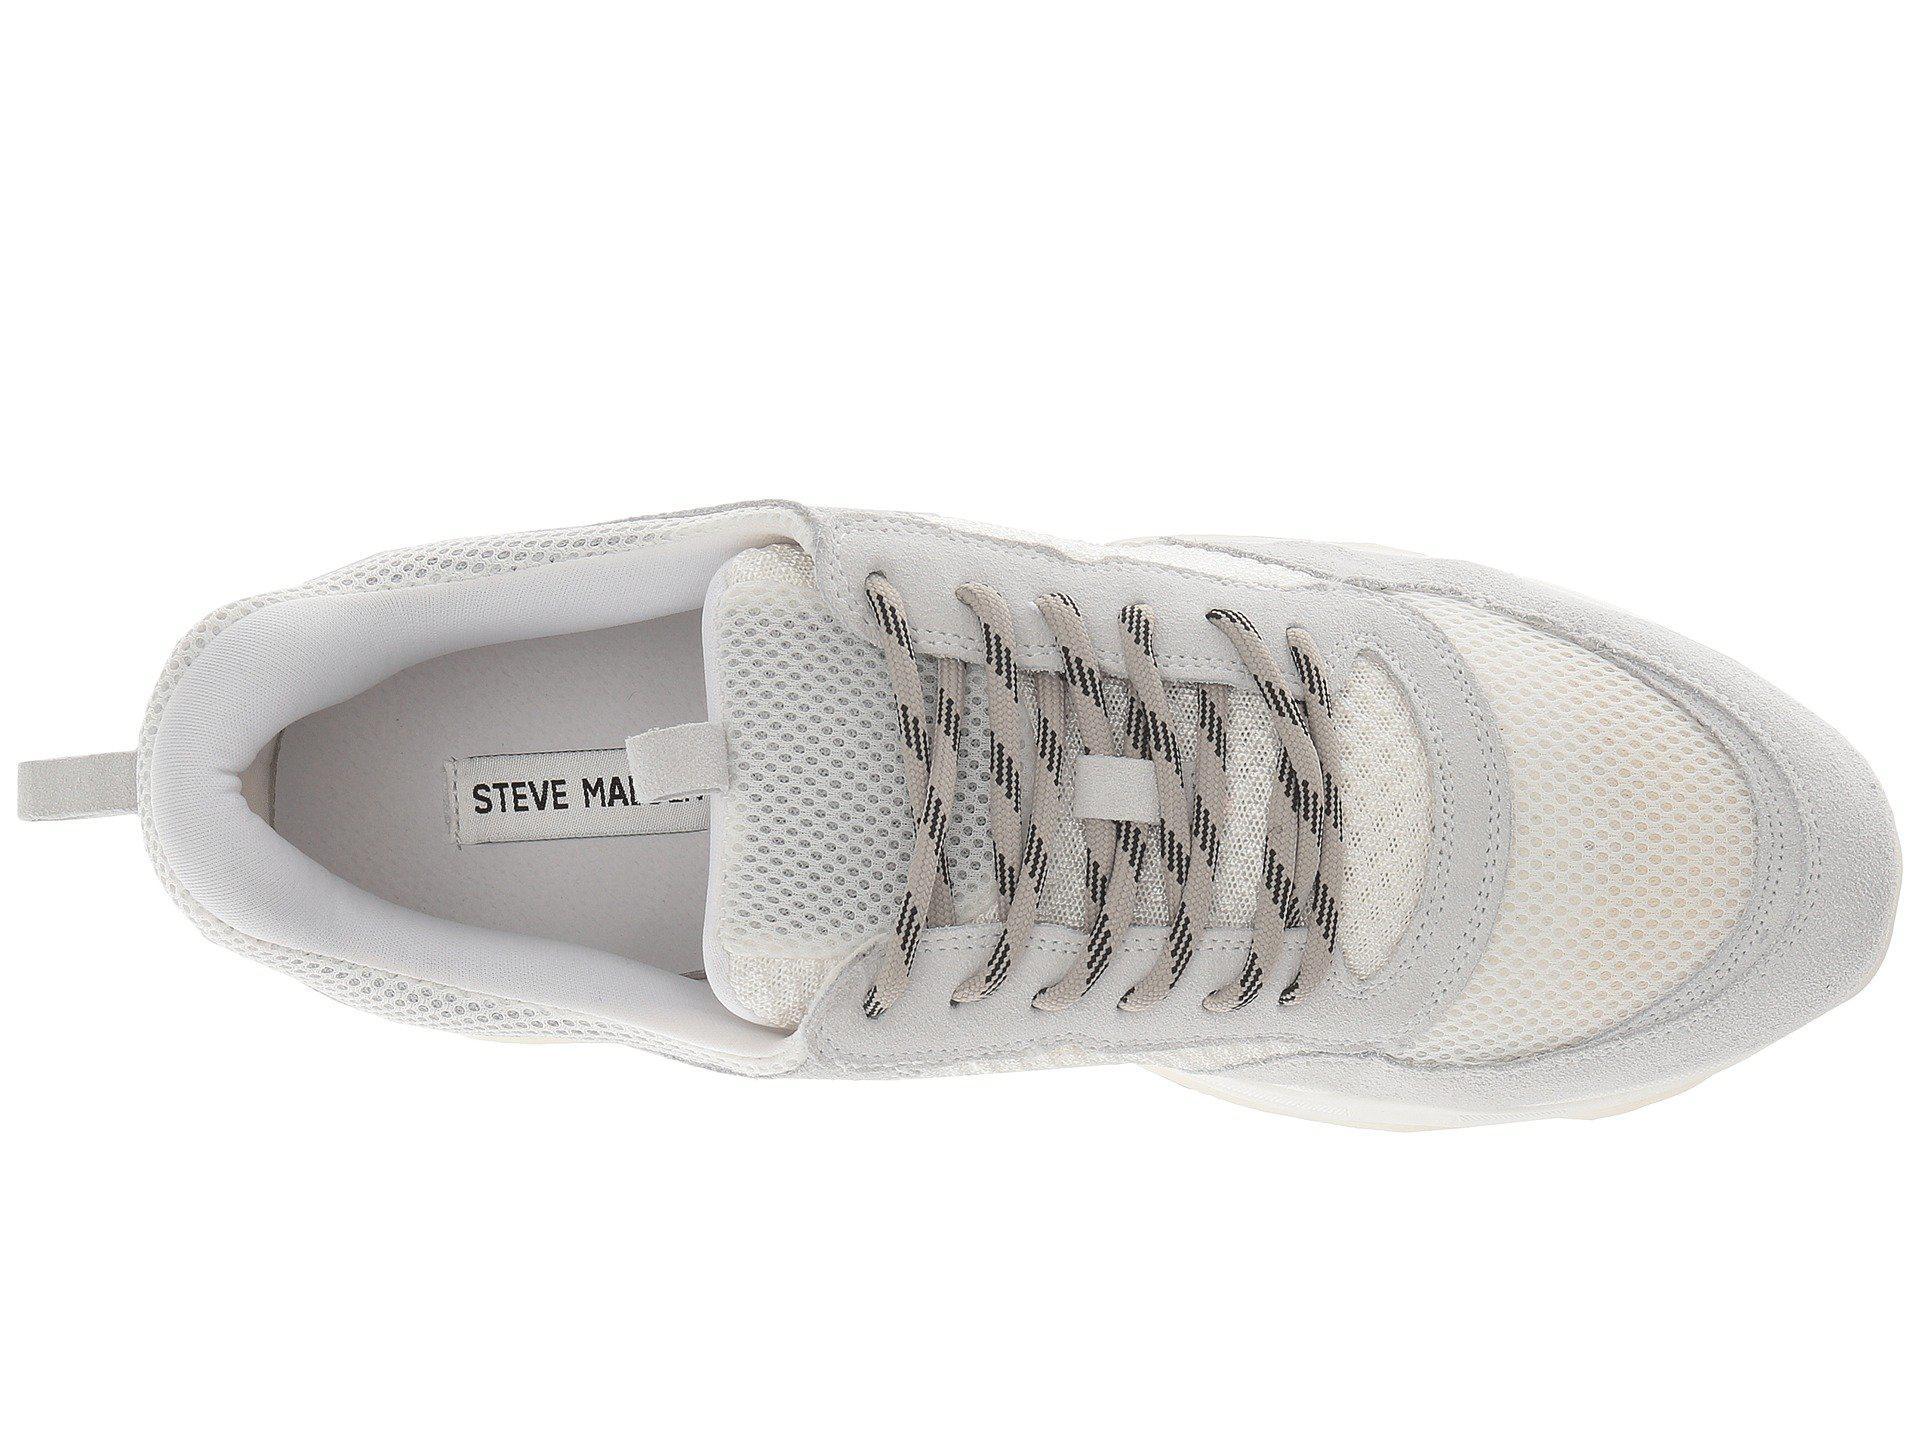 758049987aa Steve Madden Russell (white) Shoes for men